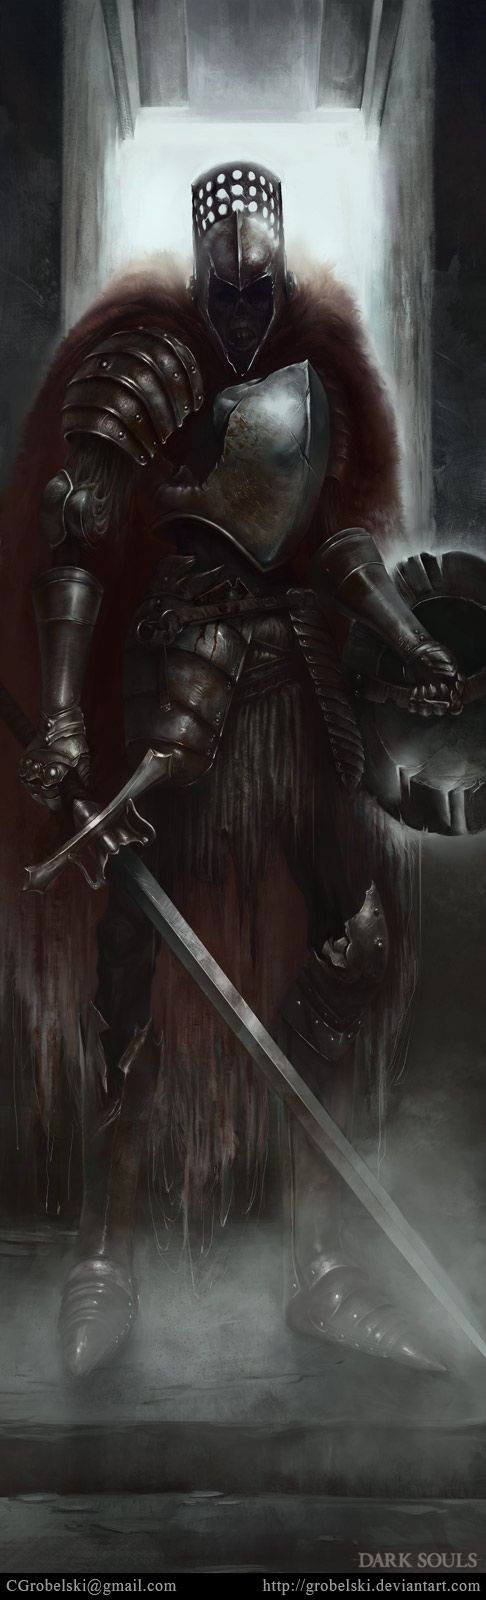 dark souls fanart by Grobelski.deviantart.com on @deviantART